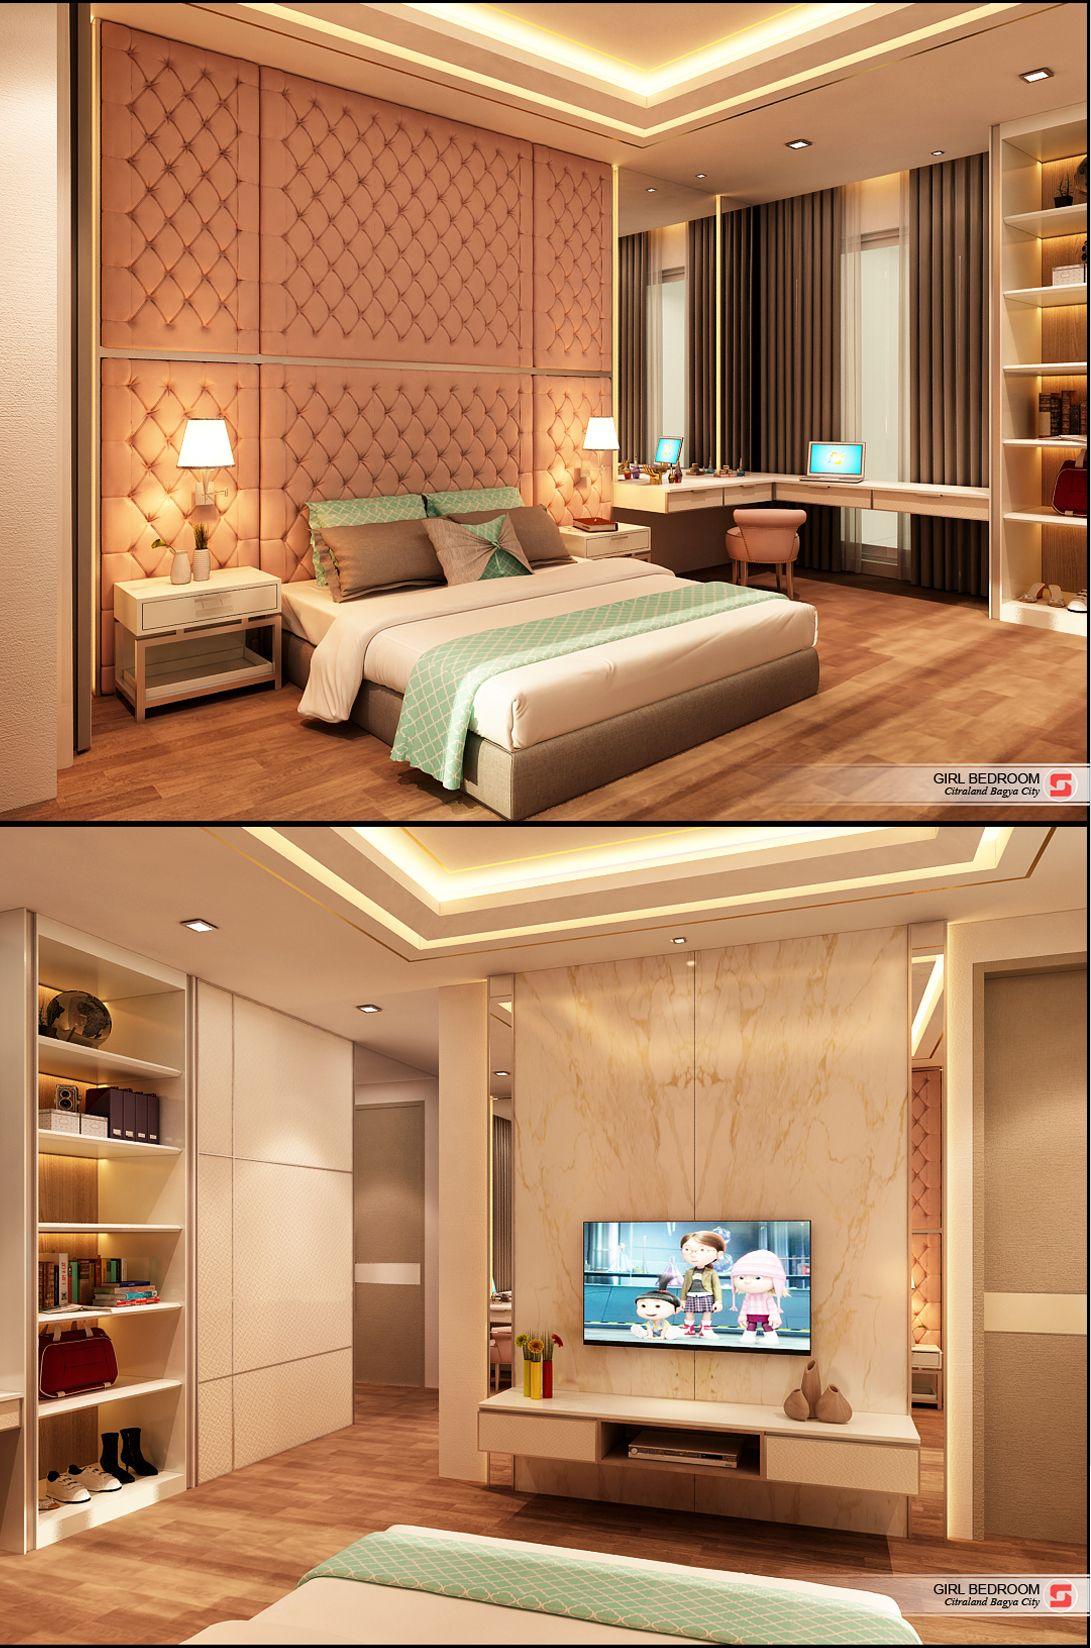 Indonesian girl bedroom